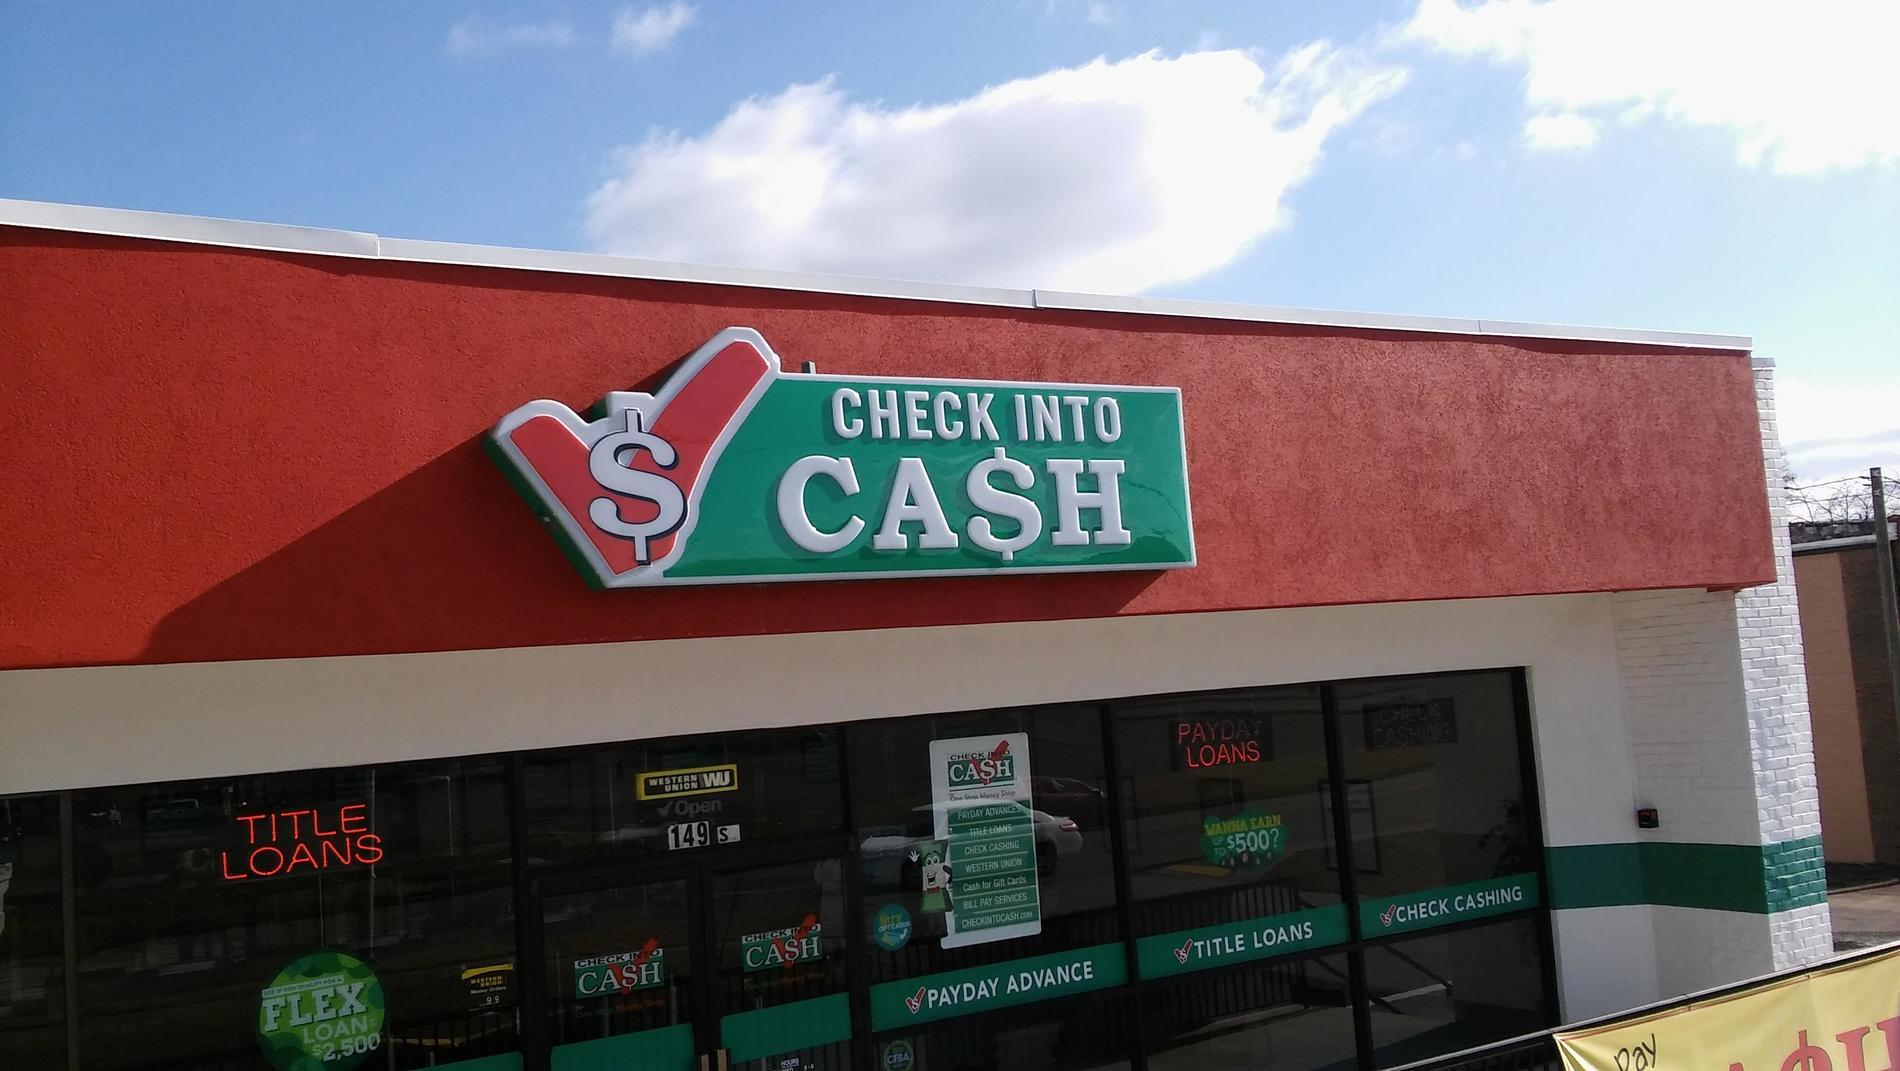 $865 Fast Payday Loans no Credit Check